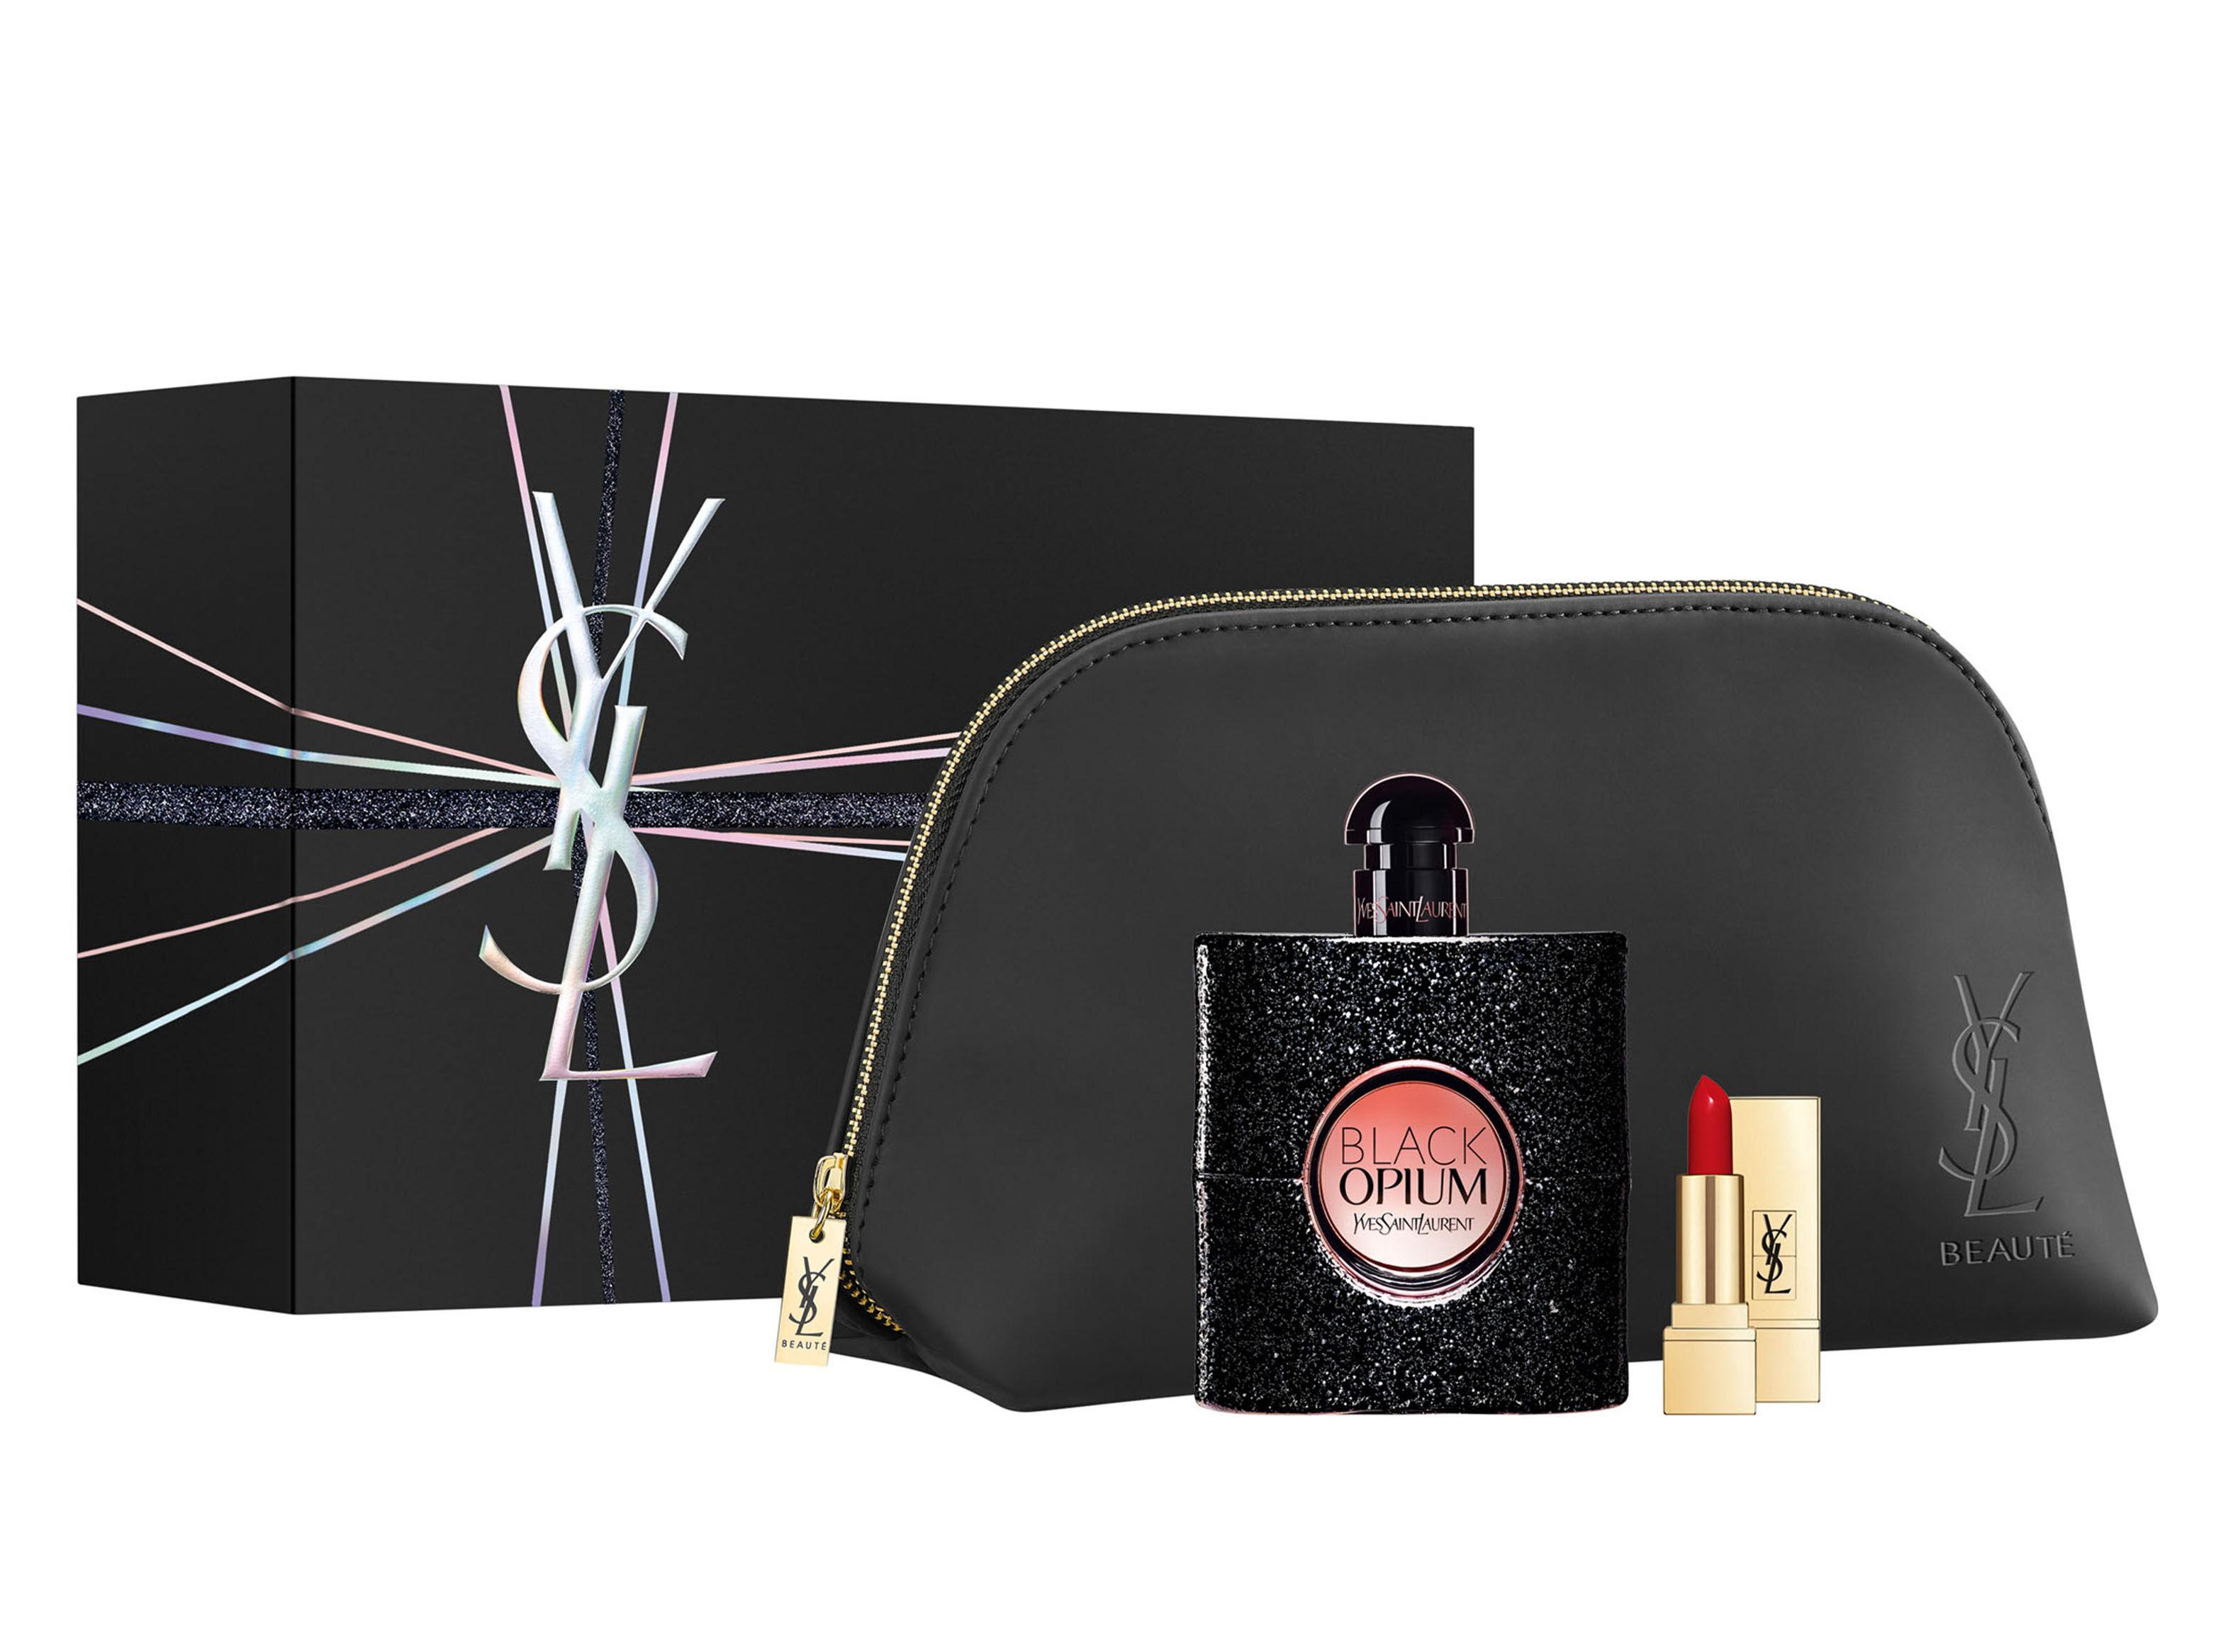 Yves Opium Set En Perfume Edp Black Saint Laurent 90 Perfumes Ml A54RjL